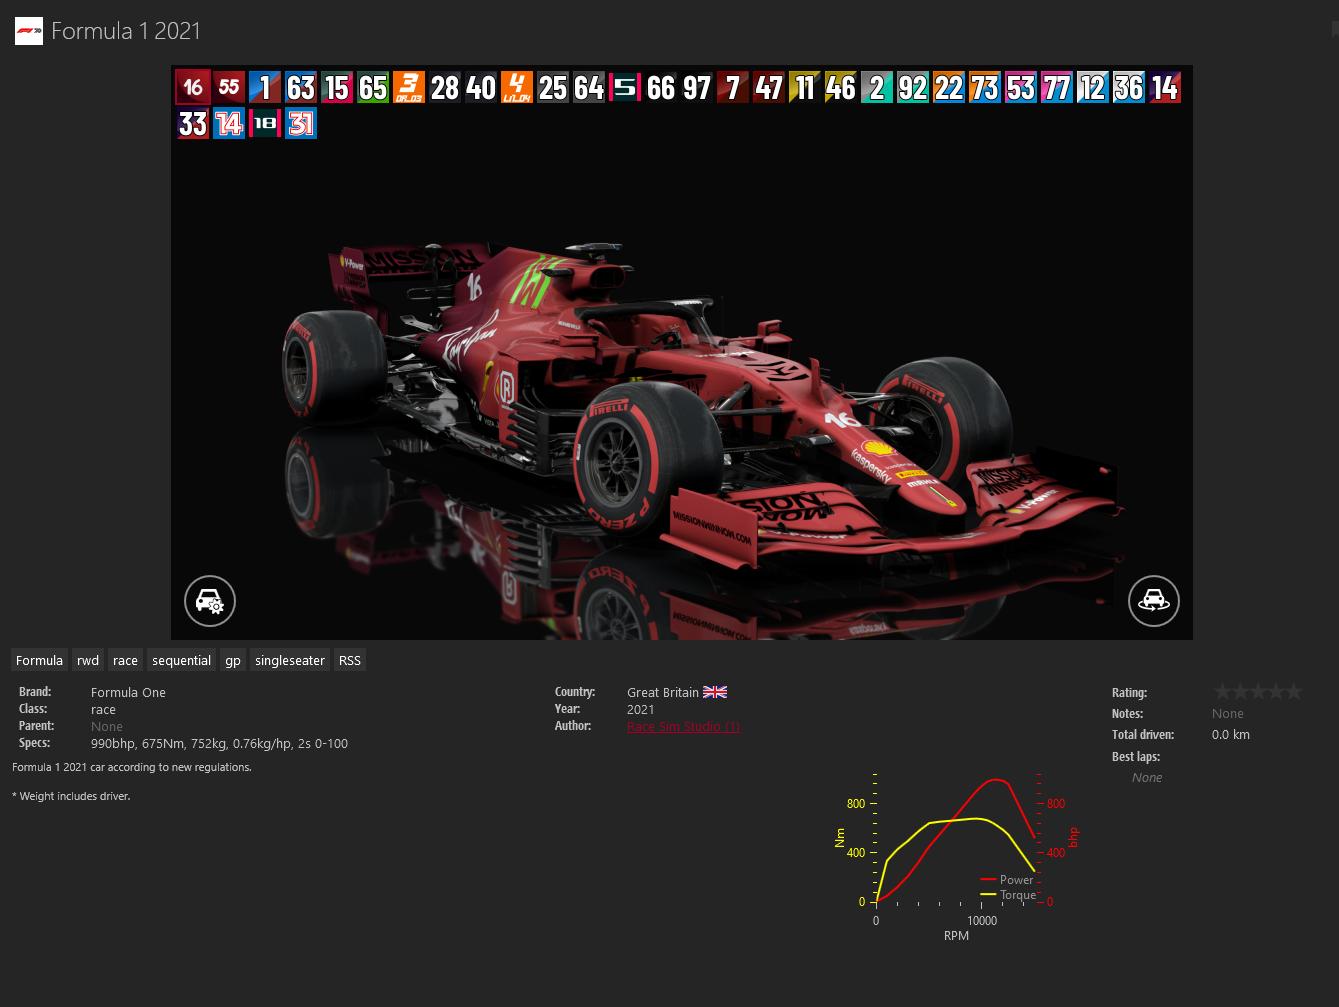 2021-03-27 15_43_55-Formula 1 2021.png